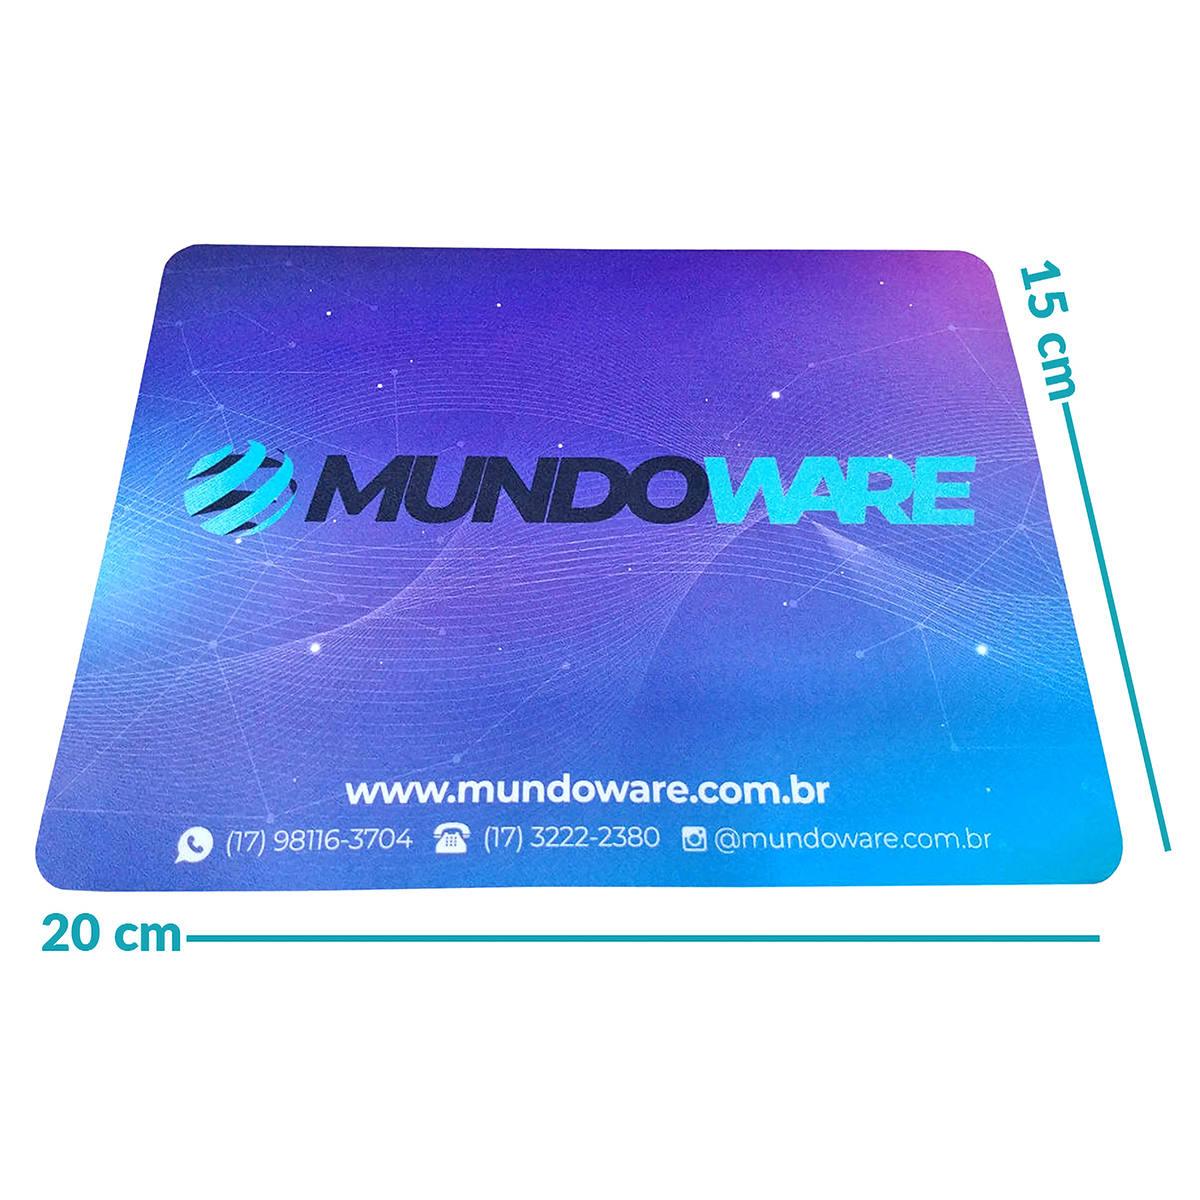 Mouse Pad Mundoware 15x20cm Compacto Base Antiderrapante